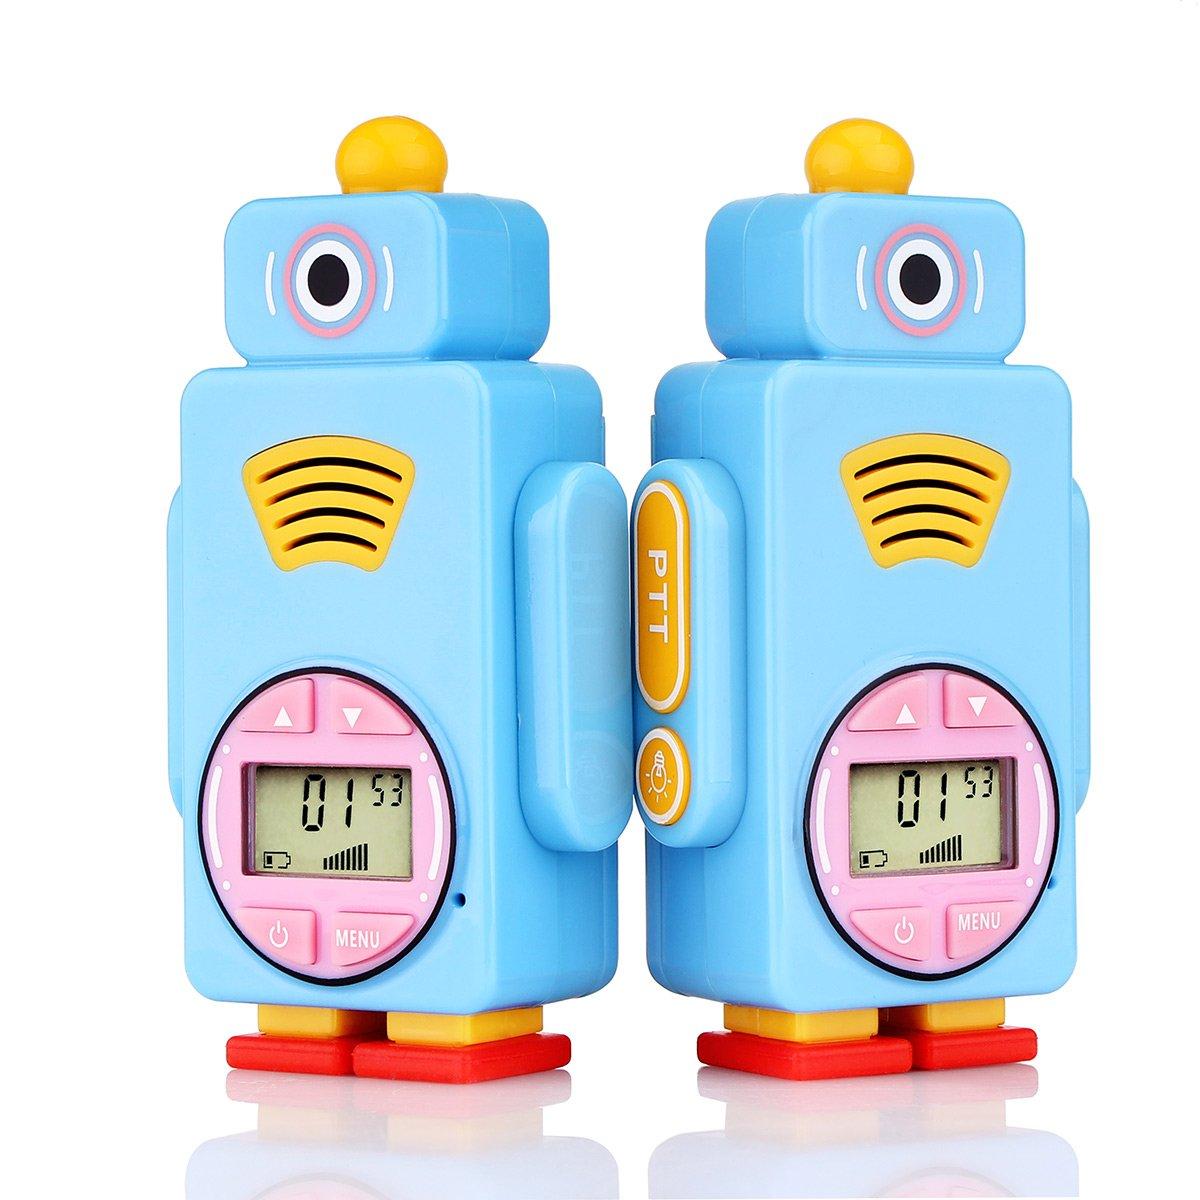 Retevis RT36 Kids Walkie Talkies Rechargeable Battery USB Charging Flashlight Long Range Crystal Sound License Free Walkie Talkies for Kids (Blue,2 Pack) by Retevis (Image #1)